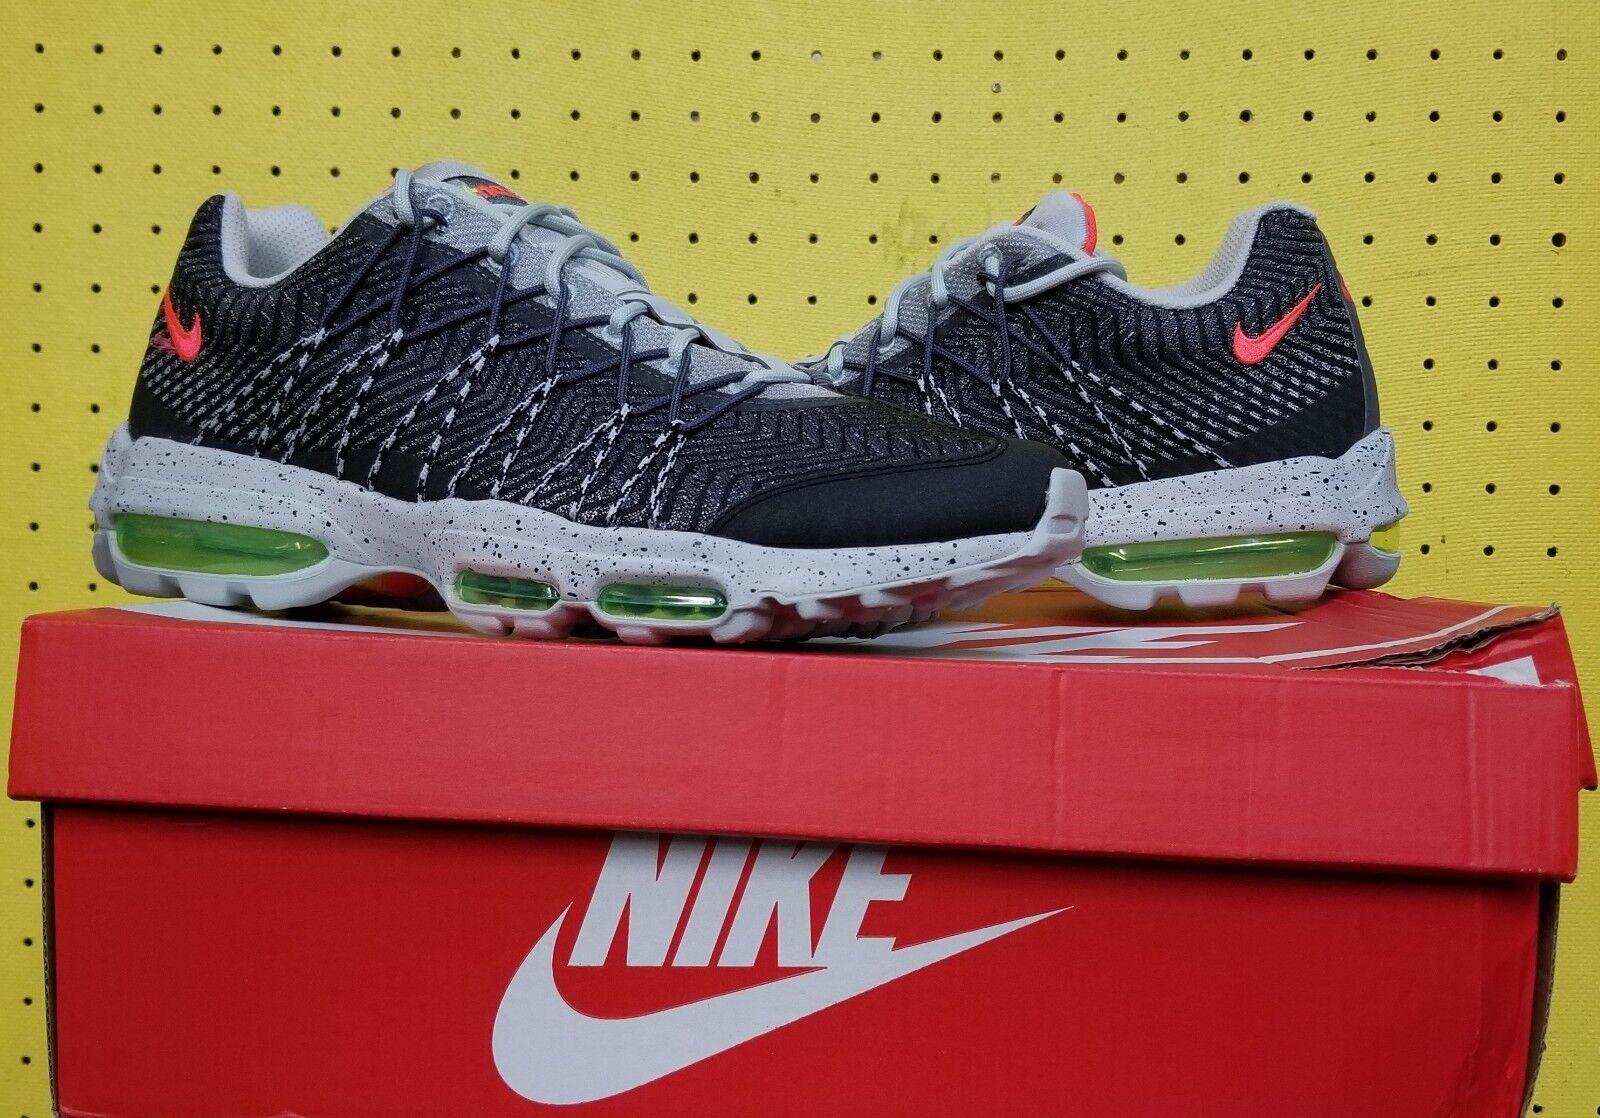 Nike air max brand new uomini 95 ultra jcrd sz 10 volt argento crimson 749771 006